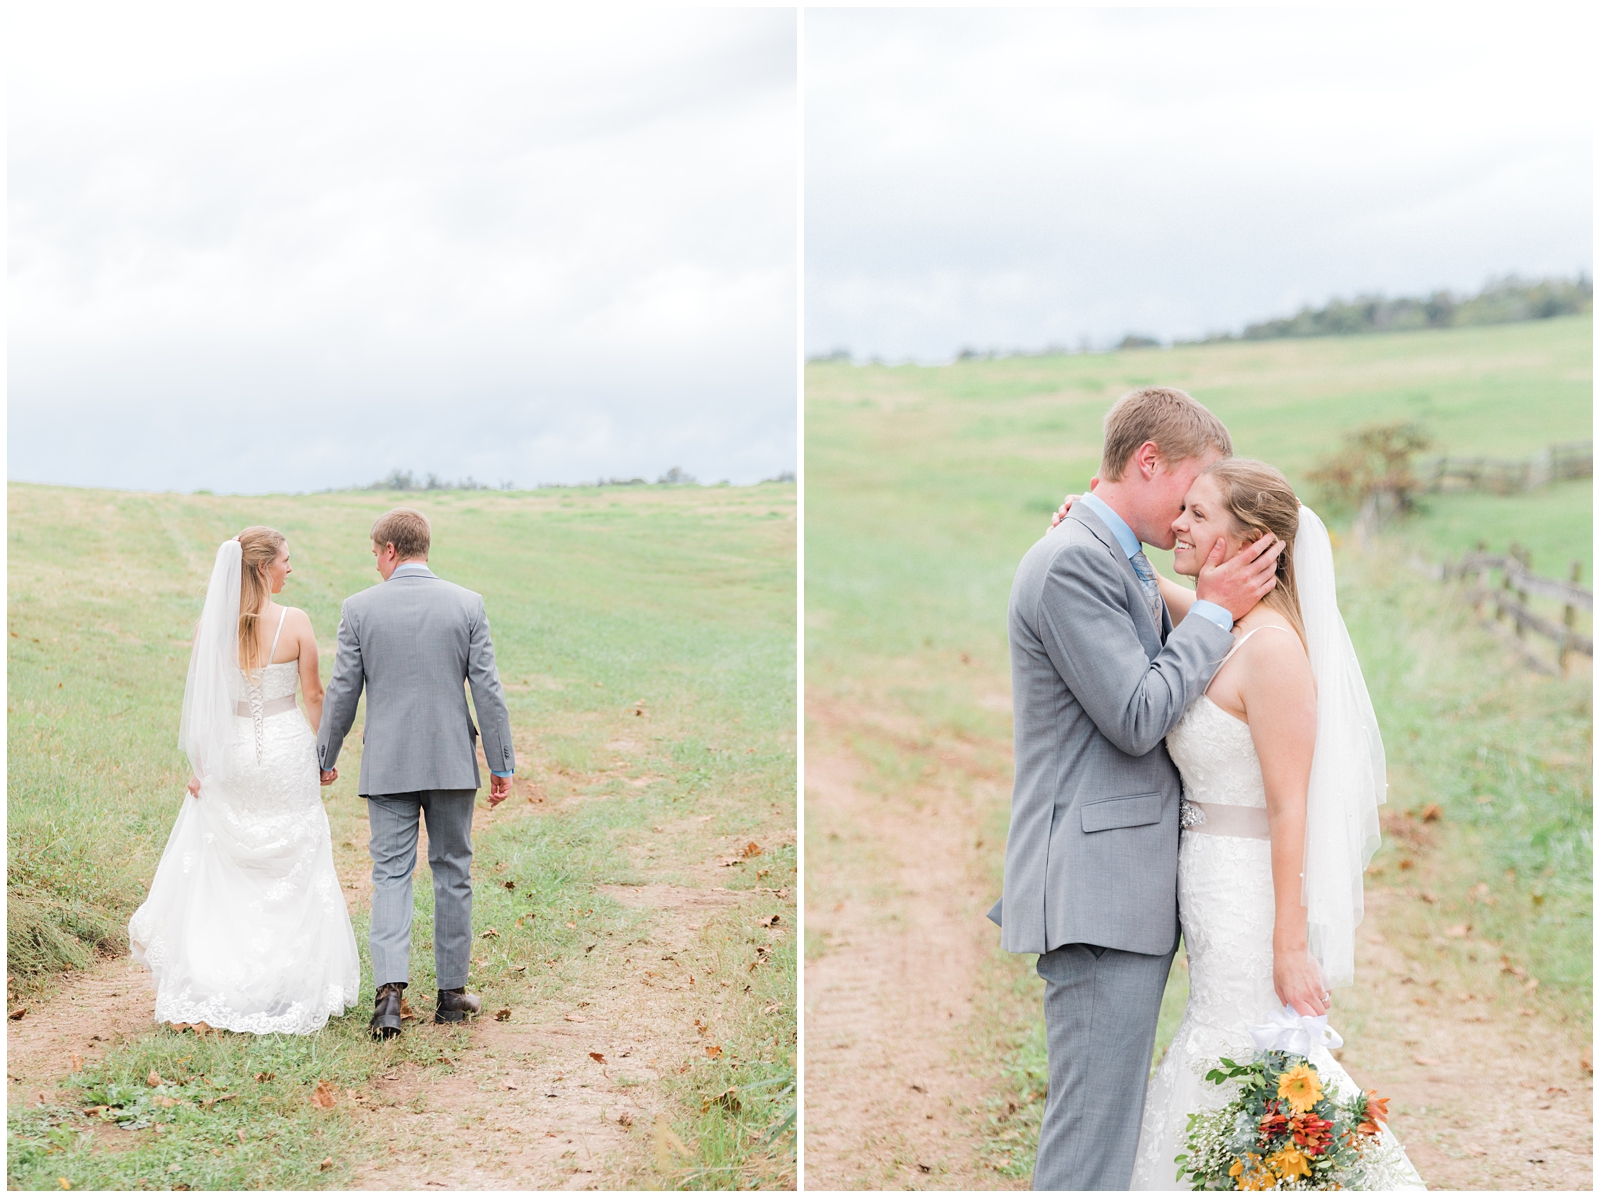 marietta-ohio-fall-wedding-LRA-Photo_0021.jpg